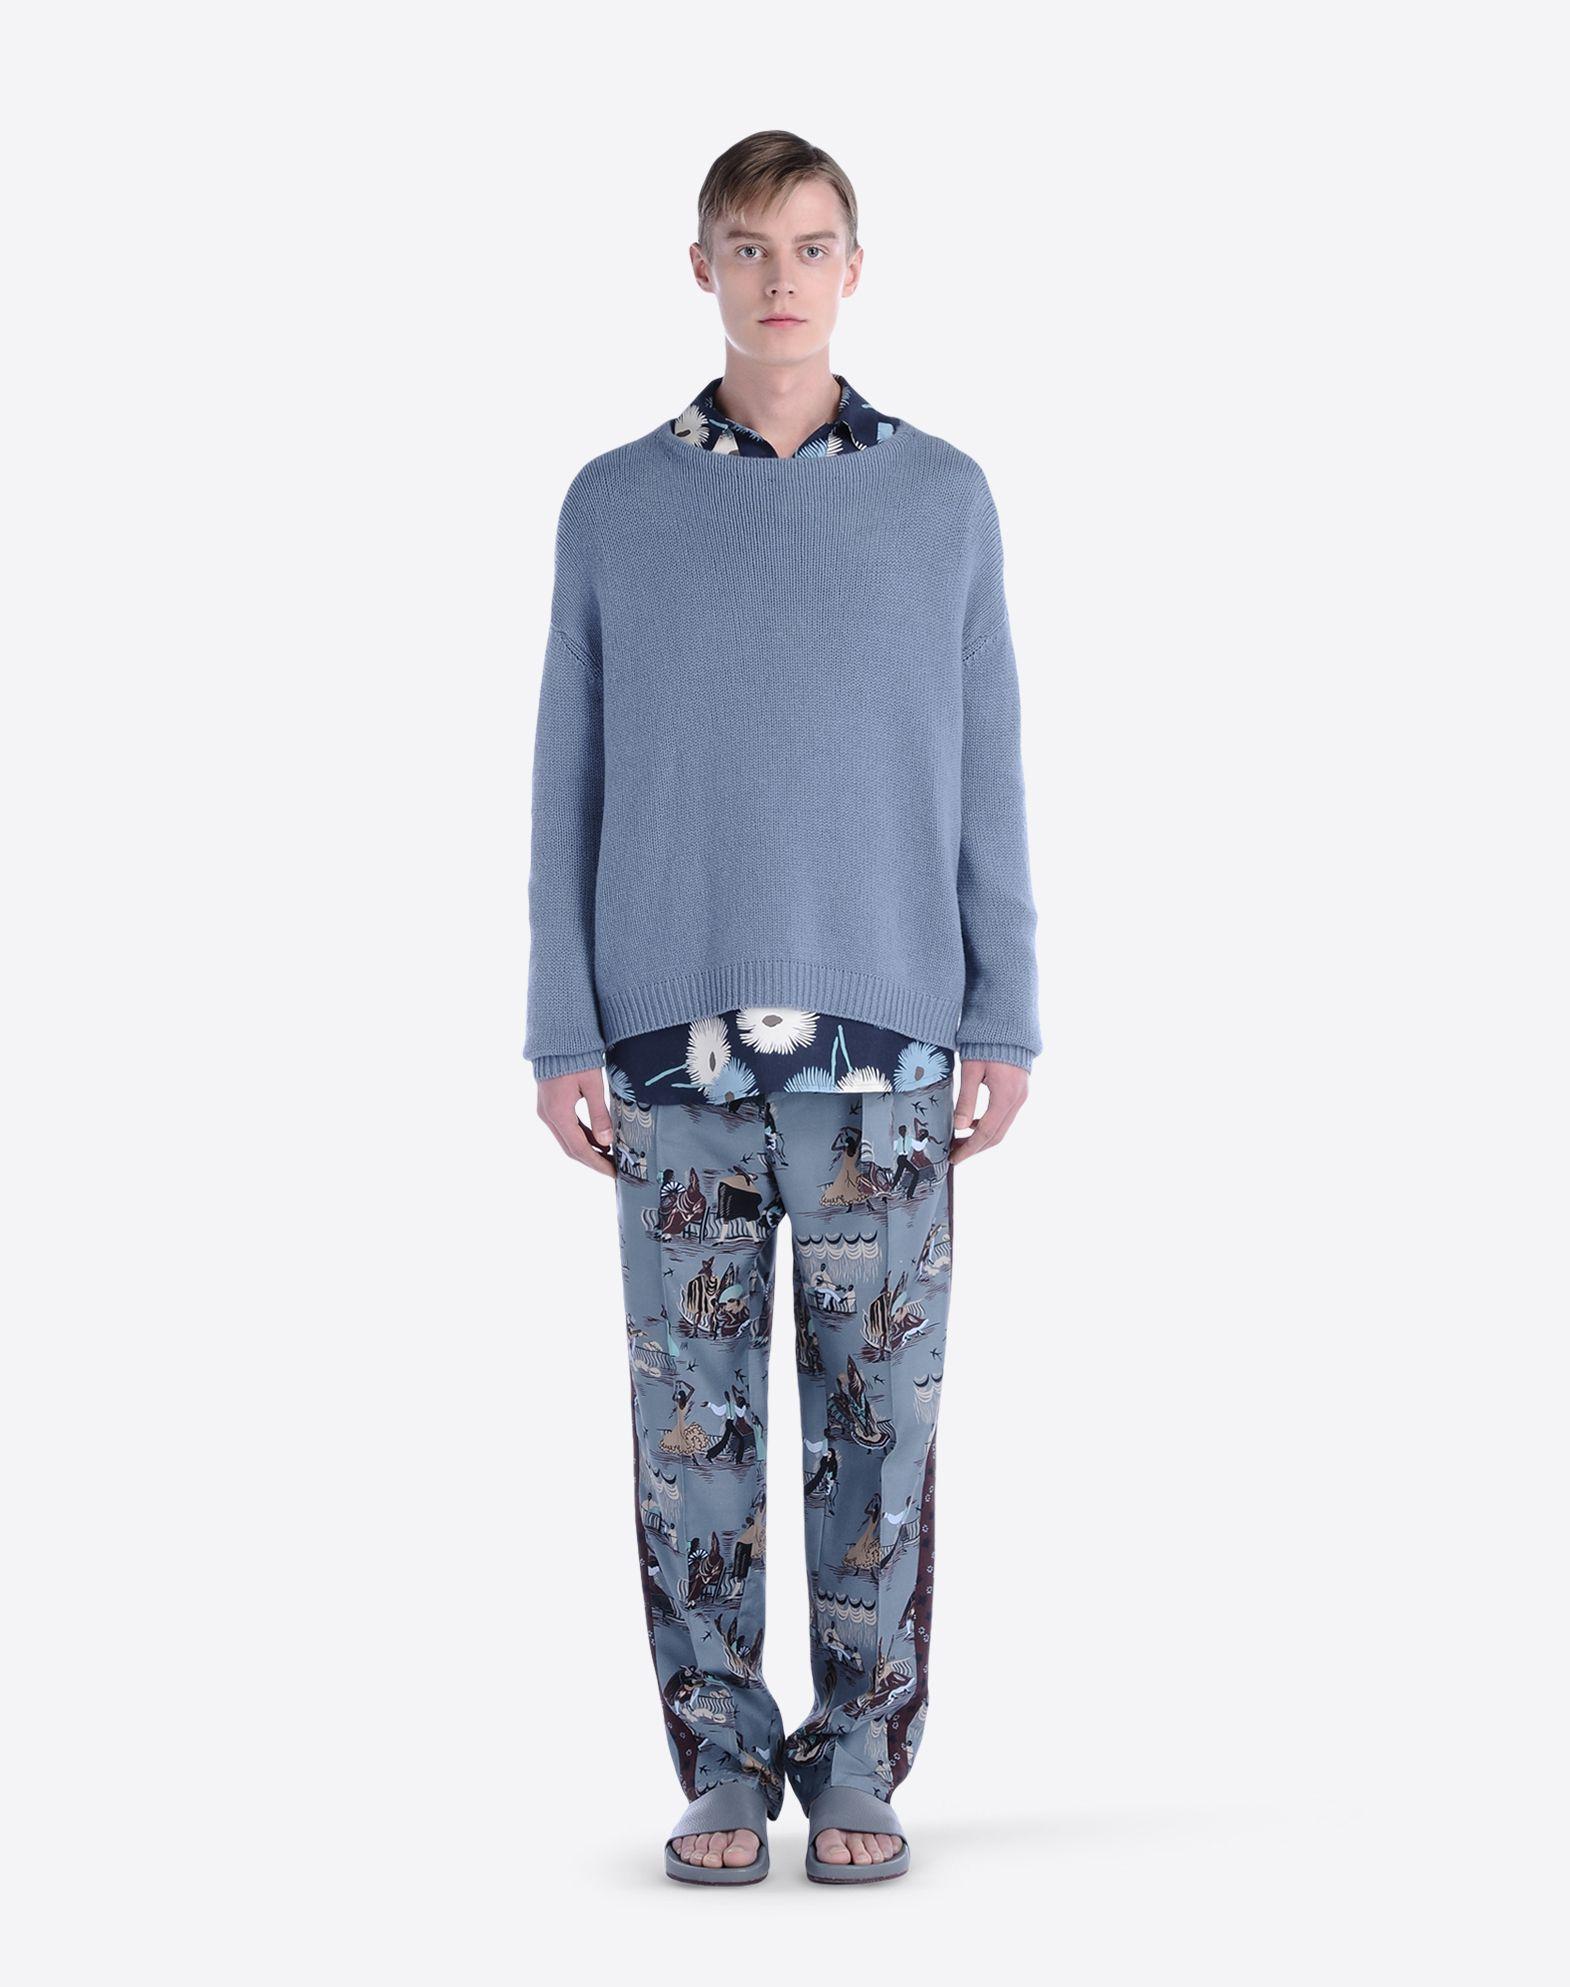 Favoloso Pantalone Baggy In Shantung Di Seta Uomo Valentino Uomo  ST65